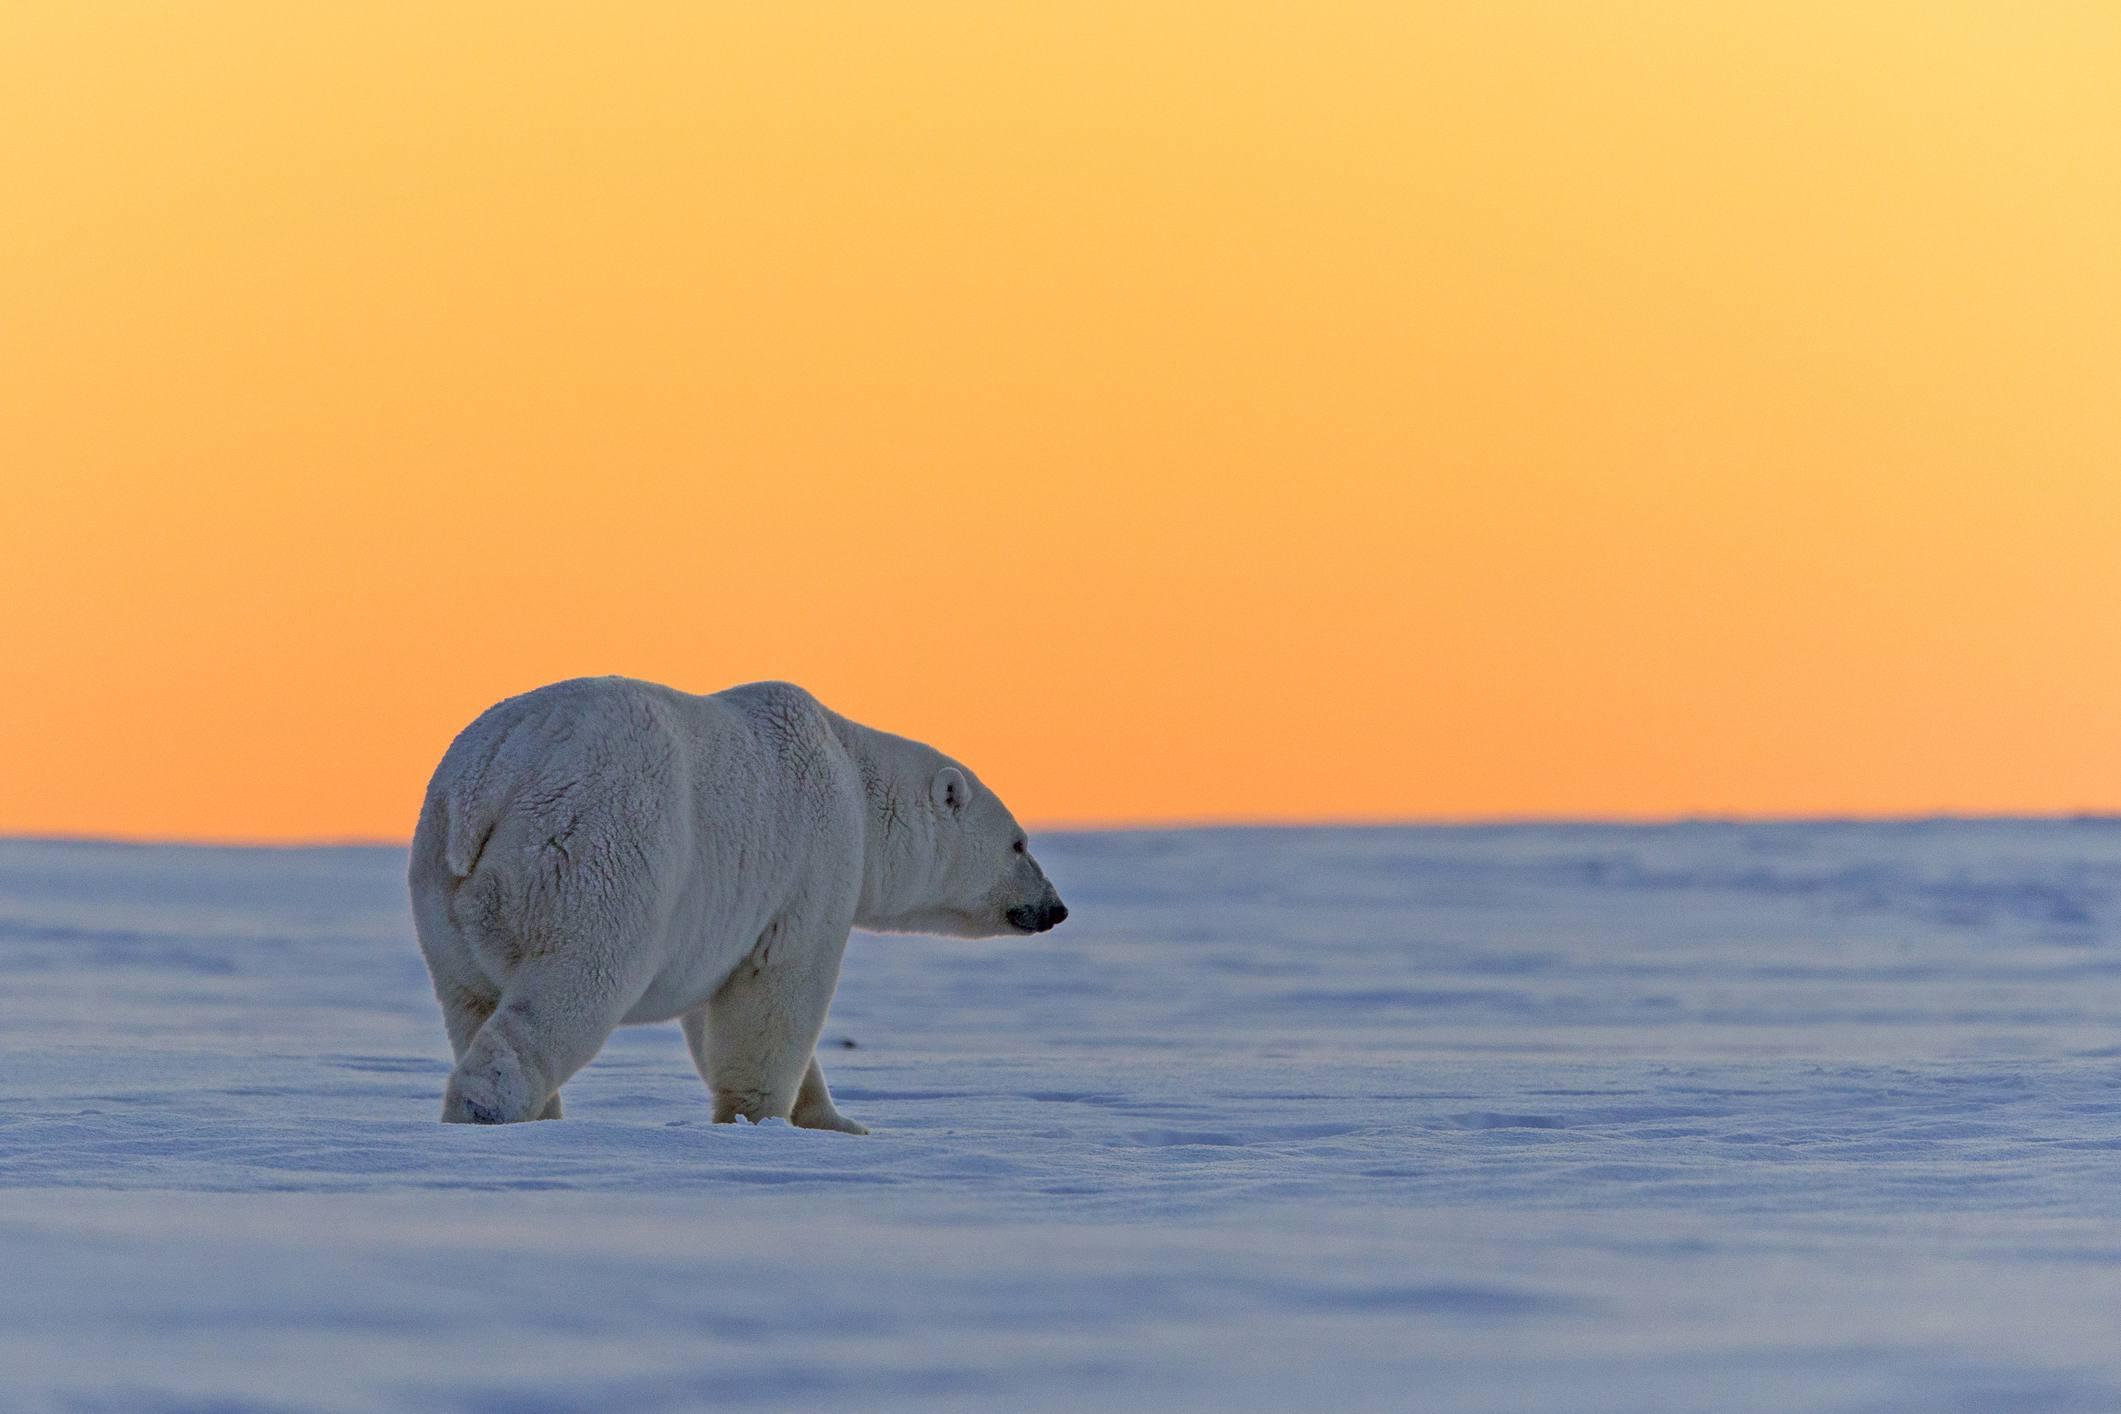 Polar bear walking alone under an orange sky